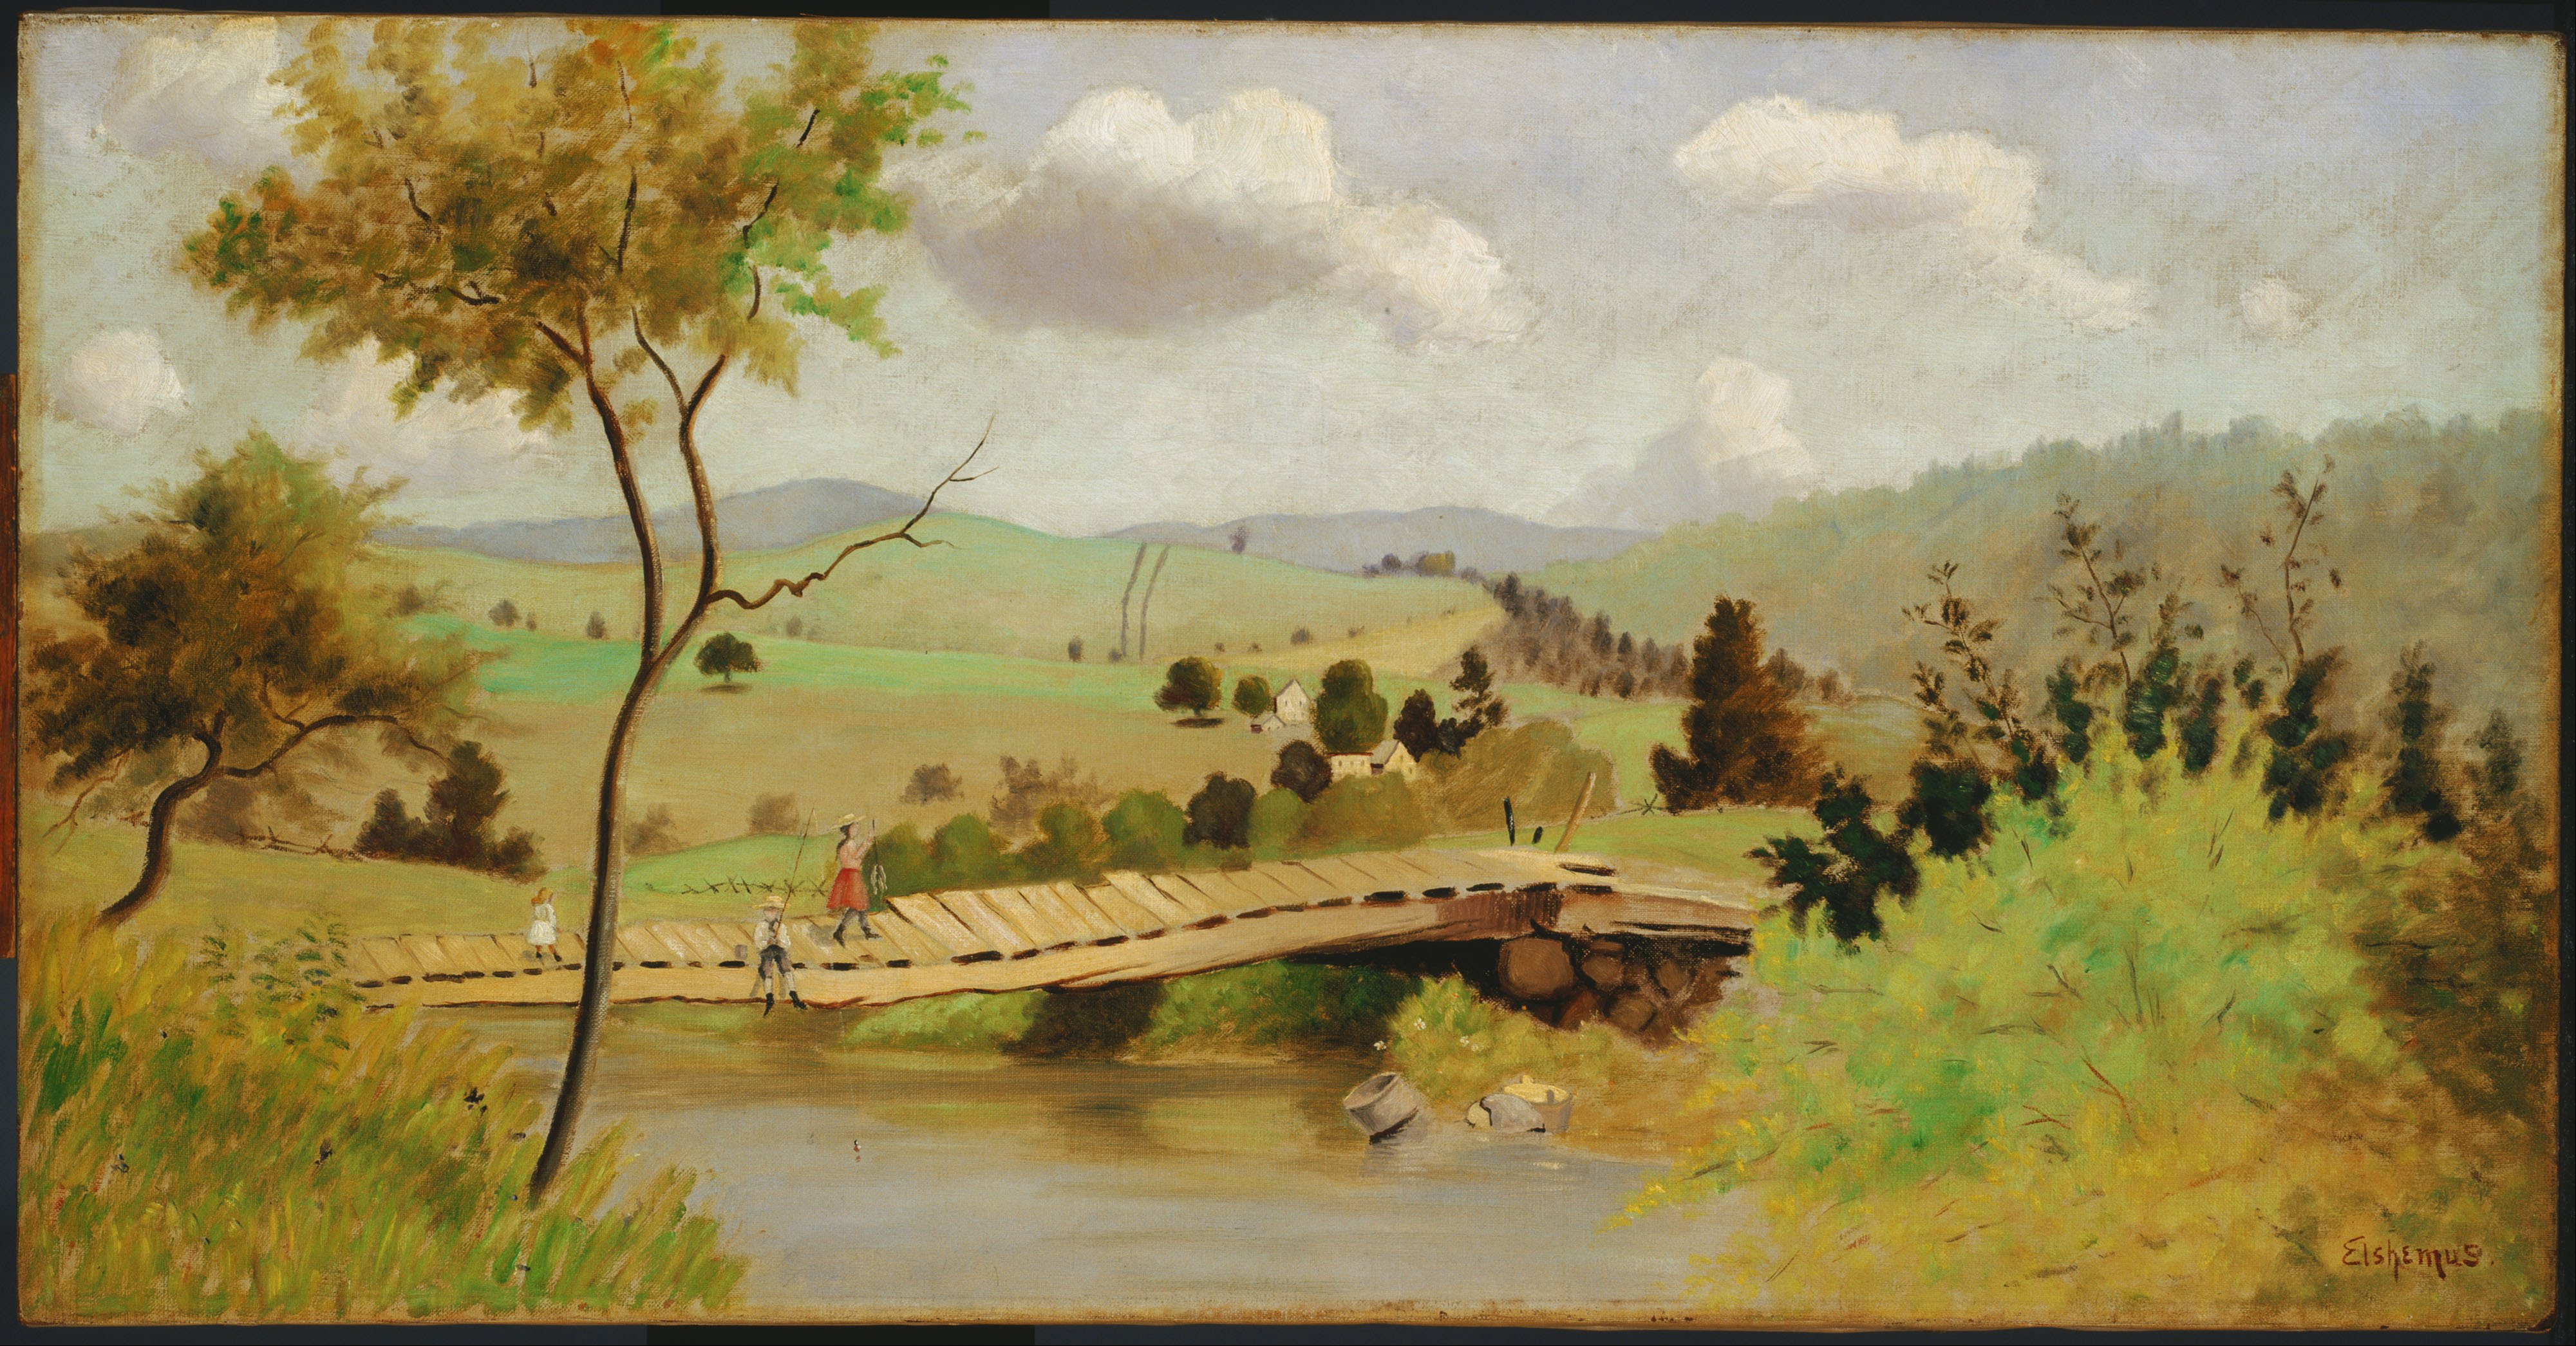 Omaž ribolovcu i ribolovu - Page 5 Louis_Michel_Eilshemius_-_Adirondacks-_Bridge_for_Fishing_-_Google_Art_Project